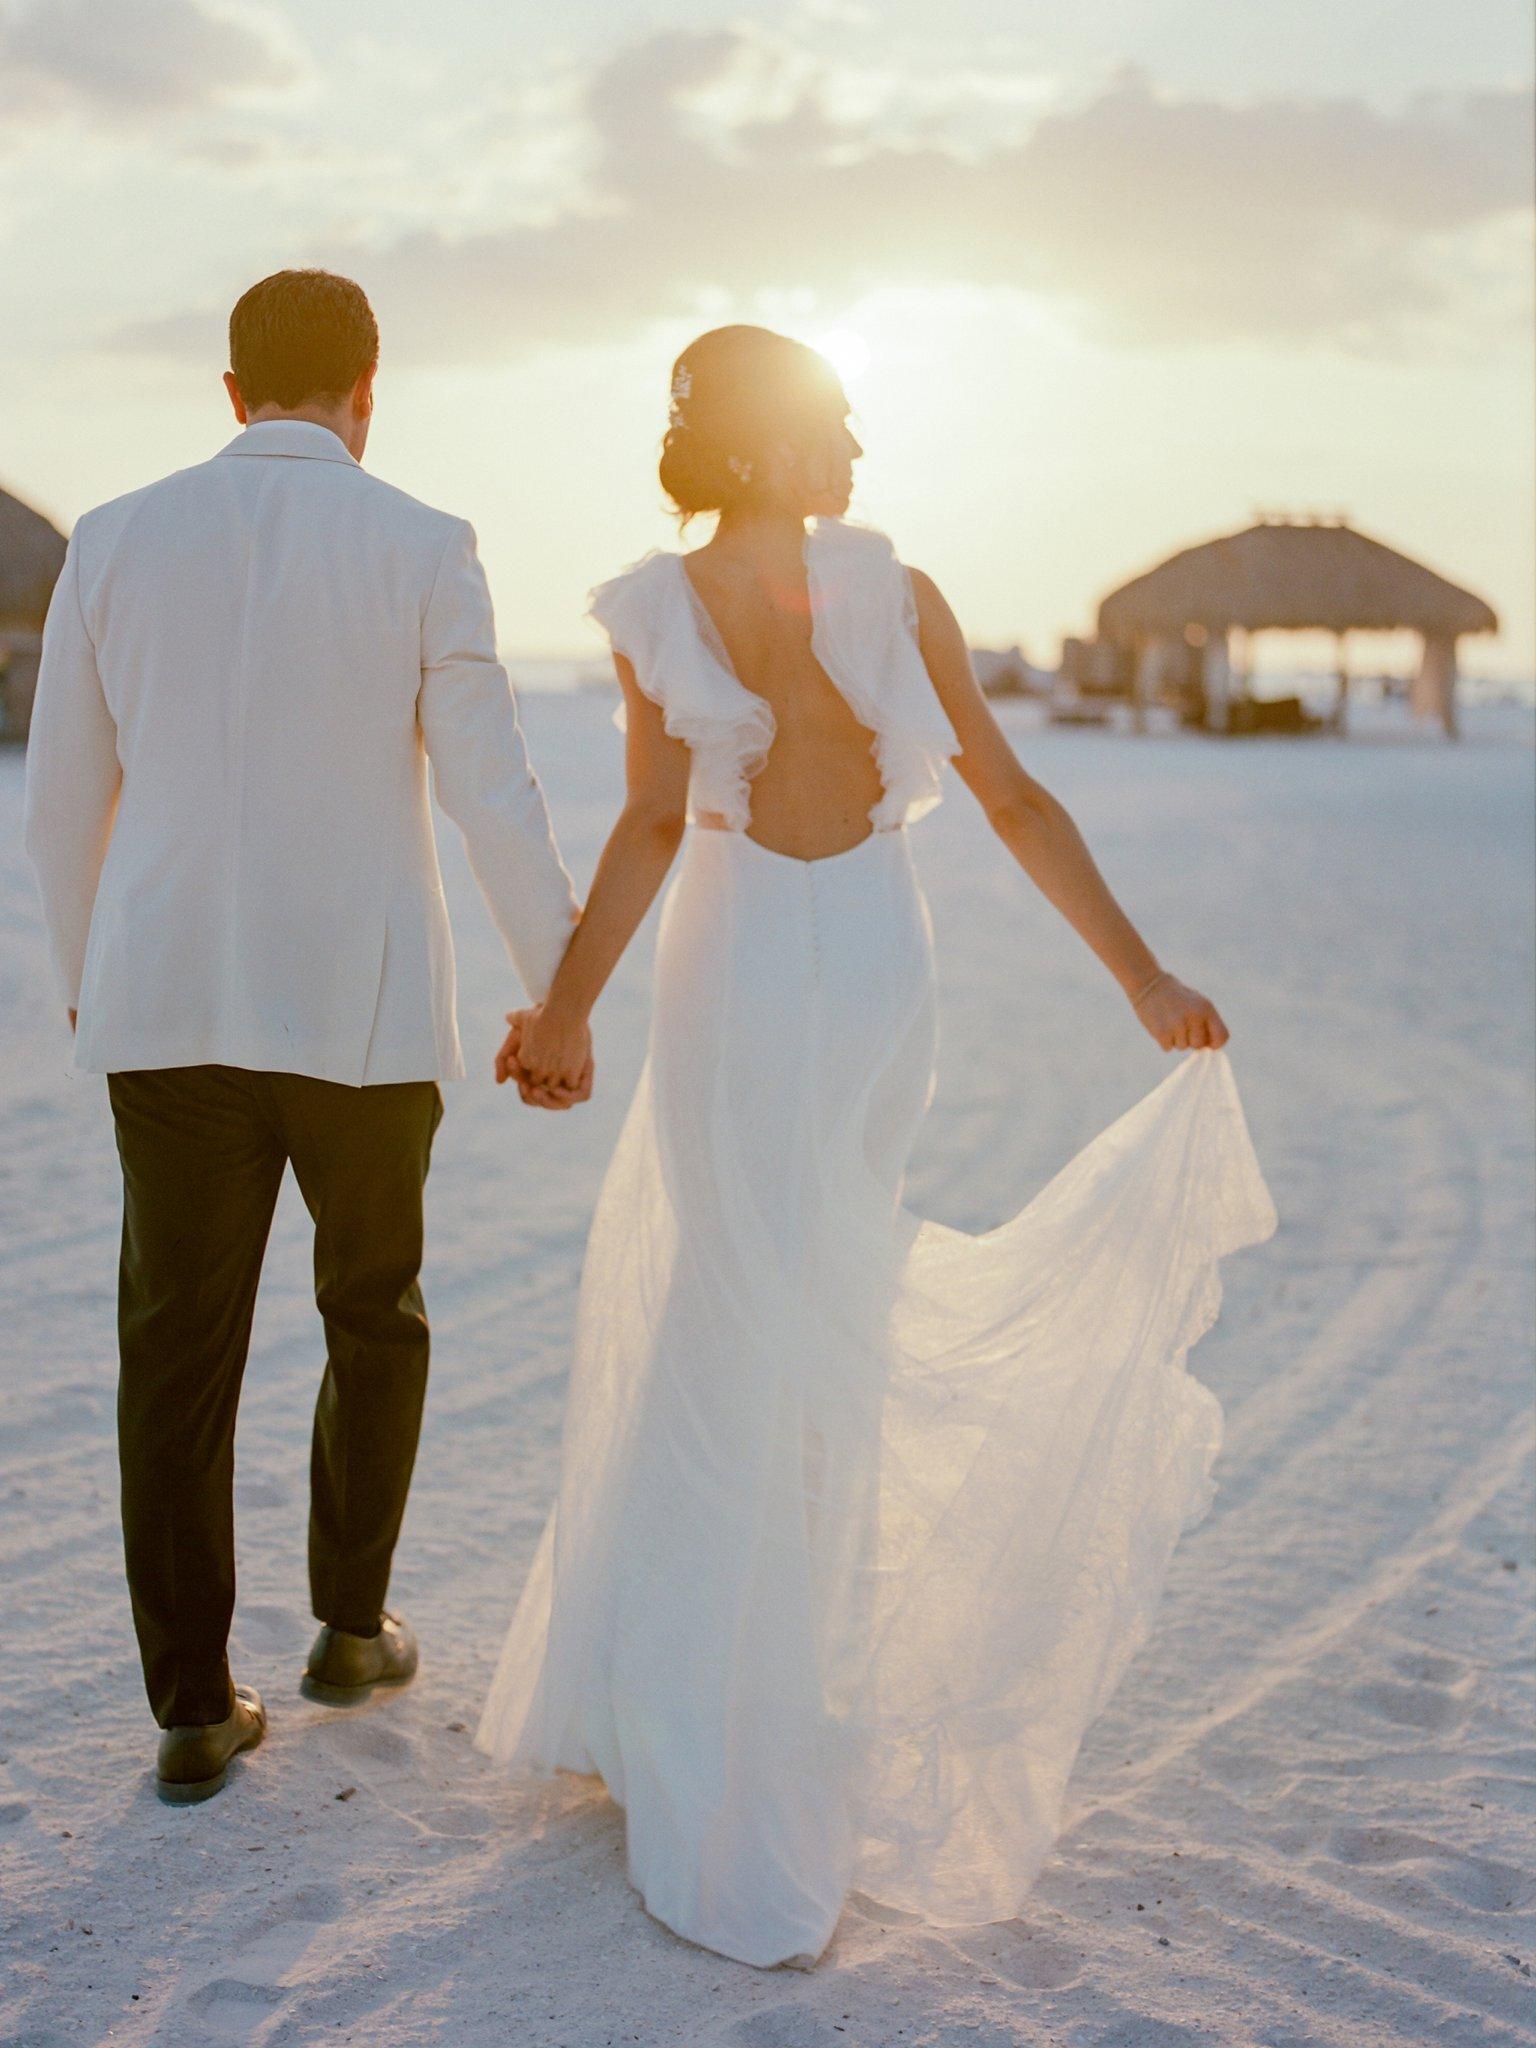 jw marriott marco island wedding photographer marco island wedding photographer shannon griffin photography_0195.jpg